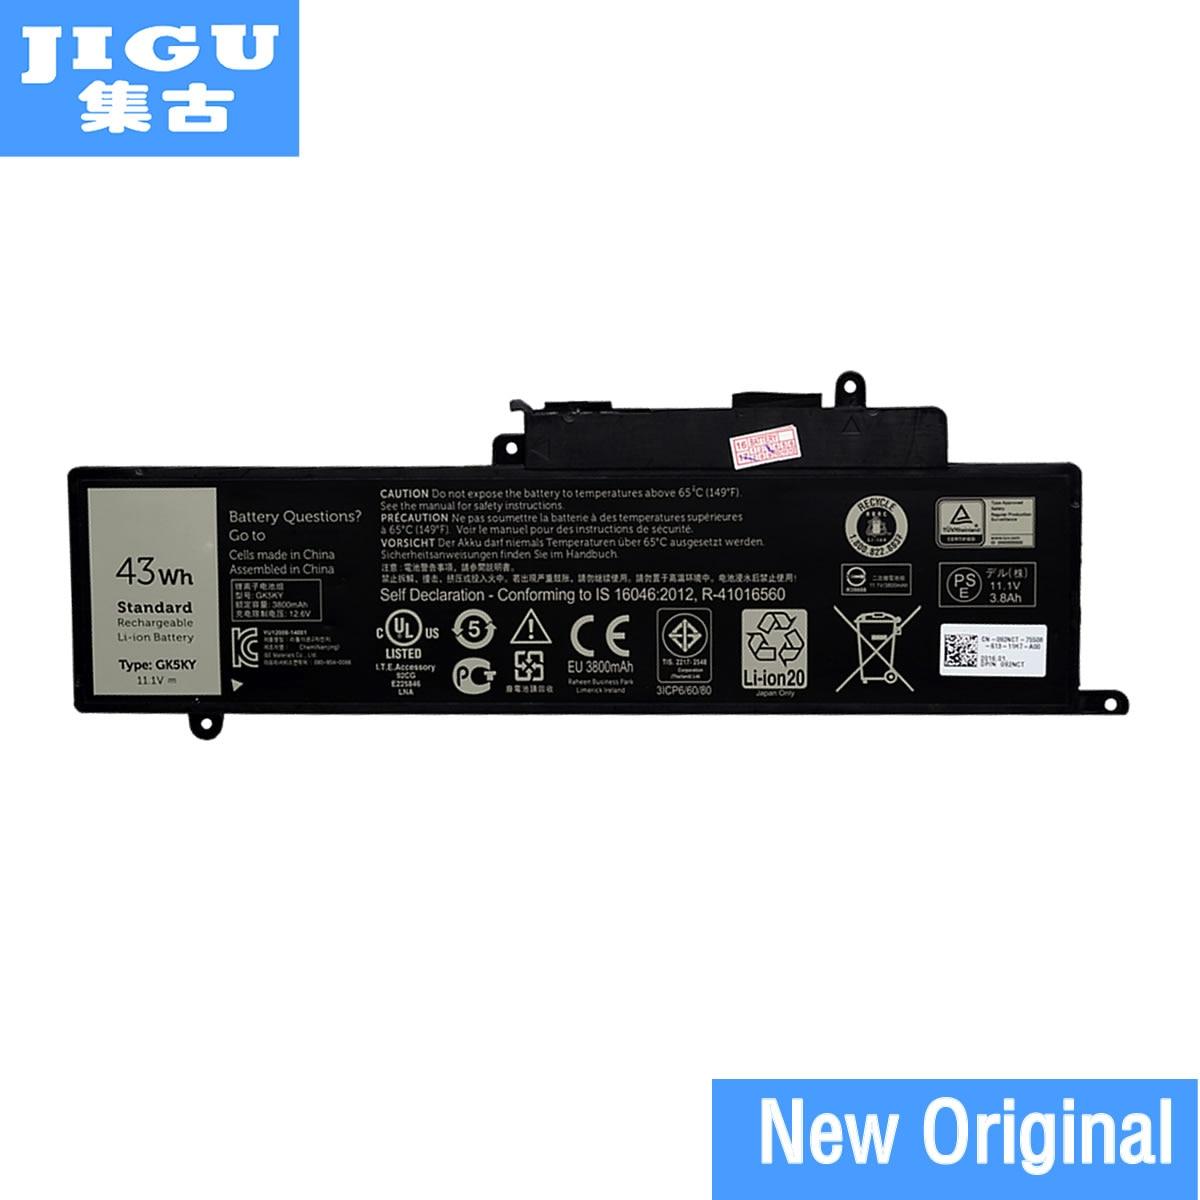 JIGU 100% New Genuine Original GK5KY Laptop Battery For DELL For Inspiron 13 7347 11 3147 04K8YH 31NP6/60/80 11.1V 43WH